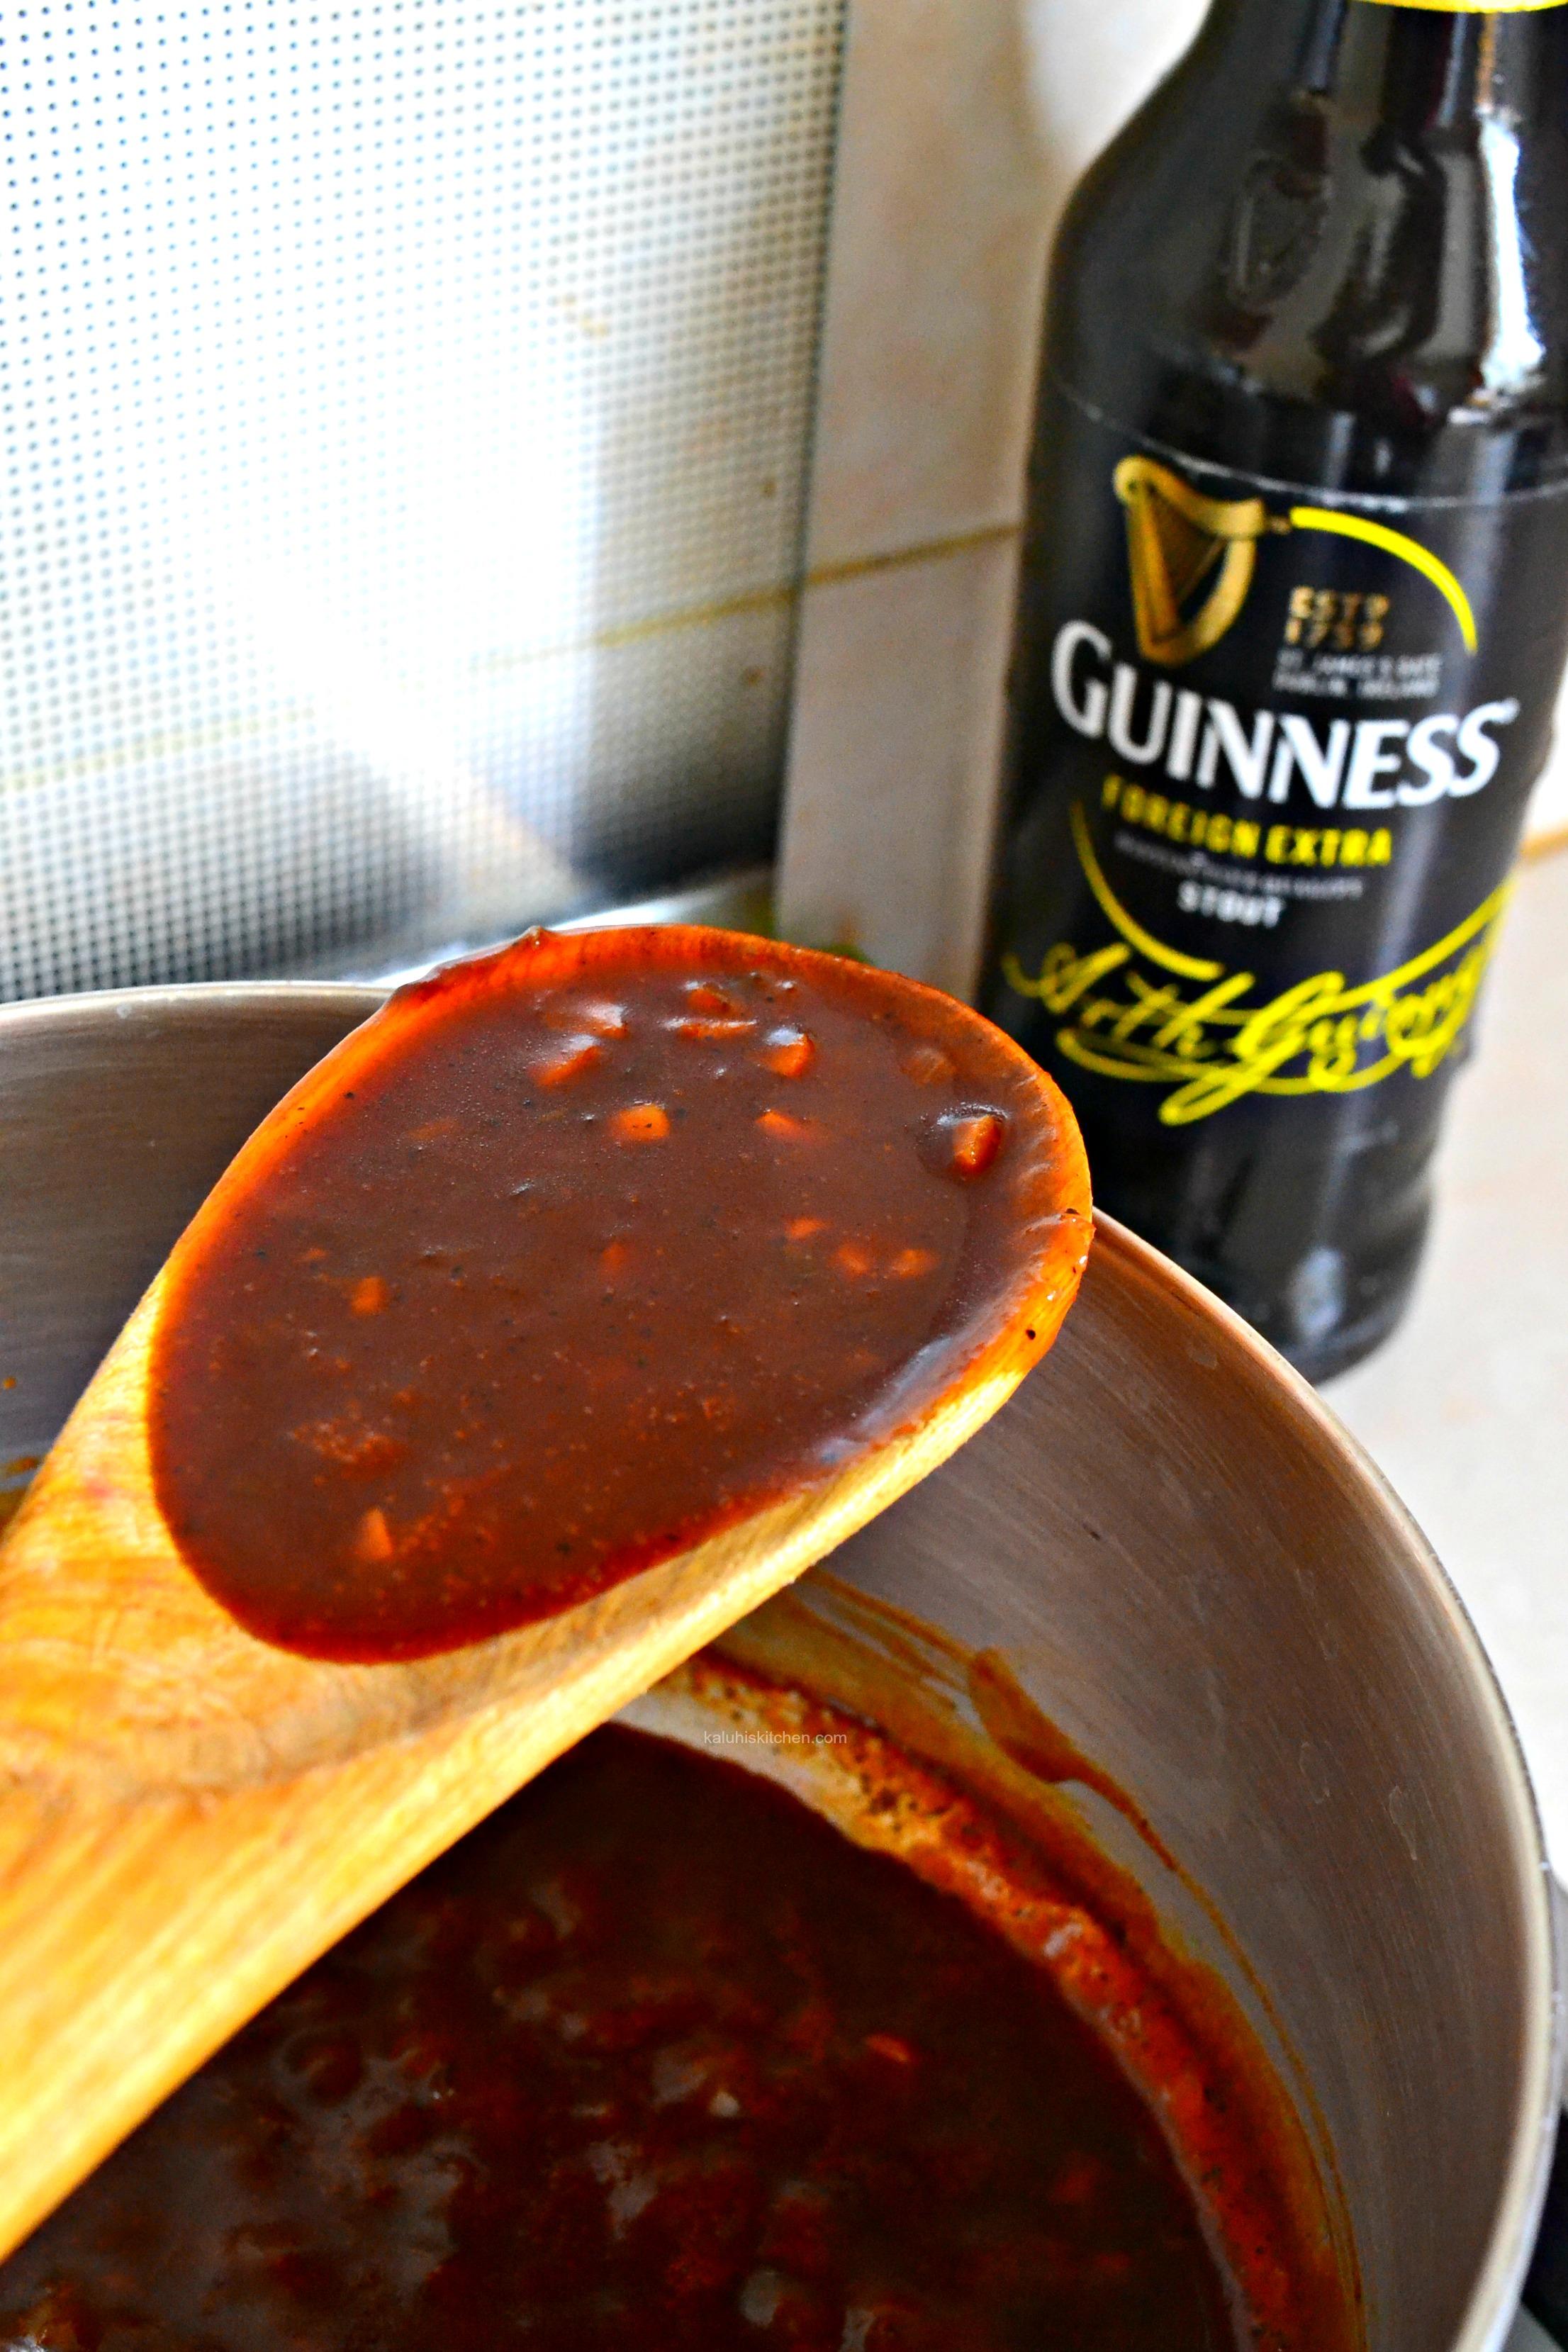 how-to-make-a-guinness-sauce_triple-d-drumsticks_easy-chicken-recipes_kaluhiskitchen-com